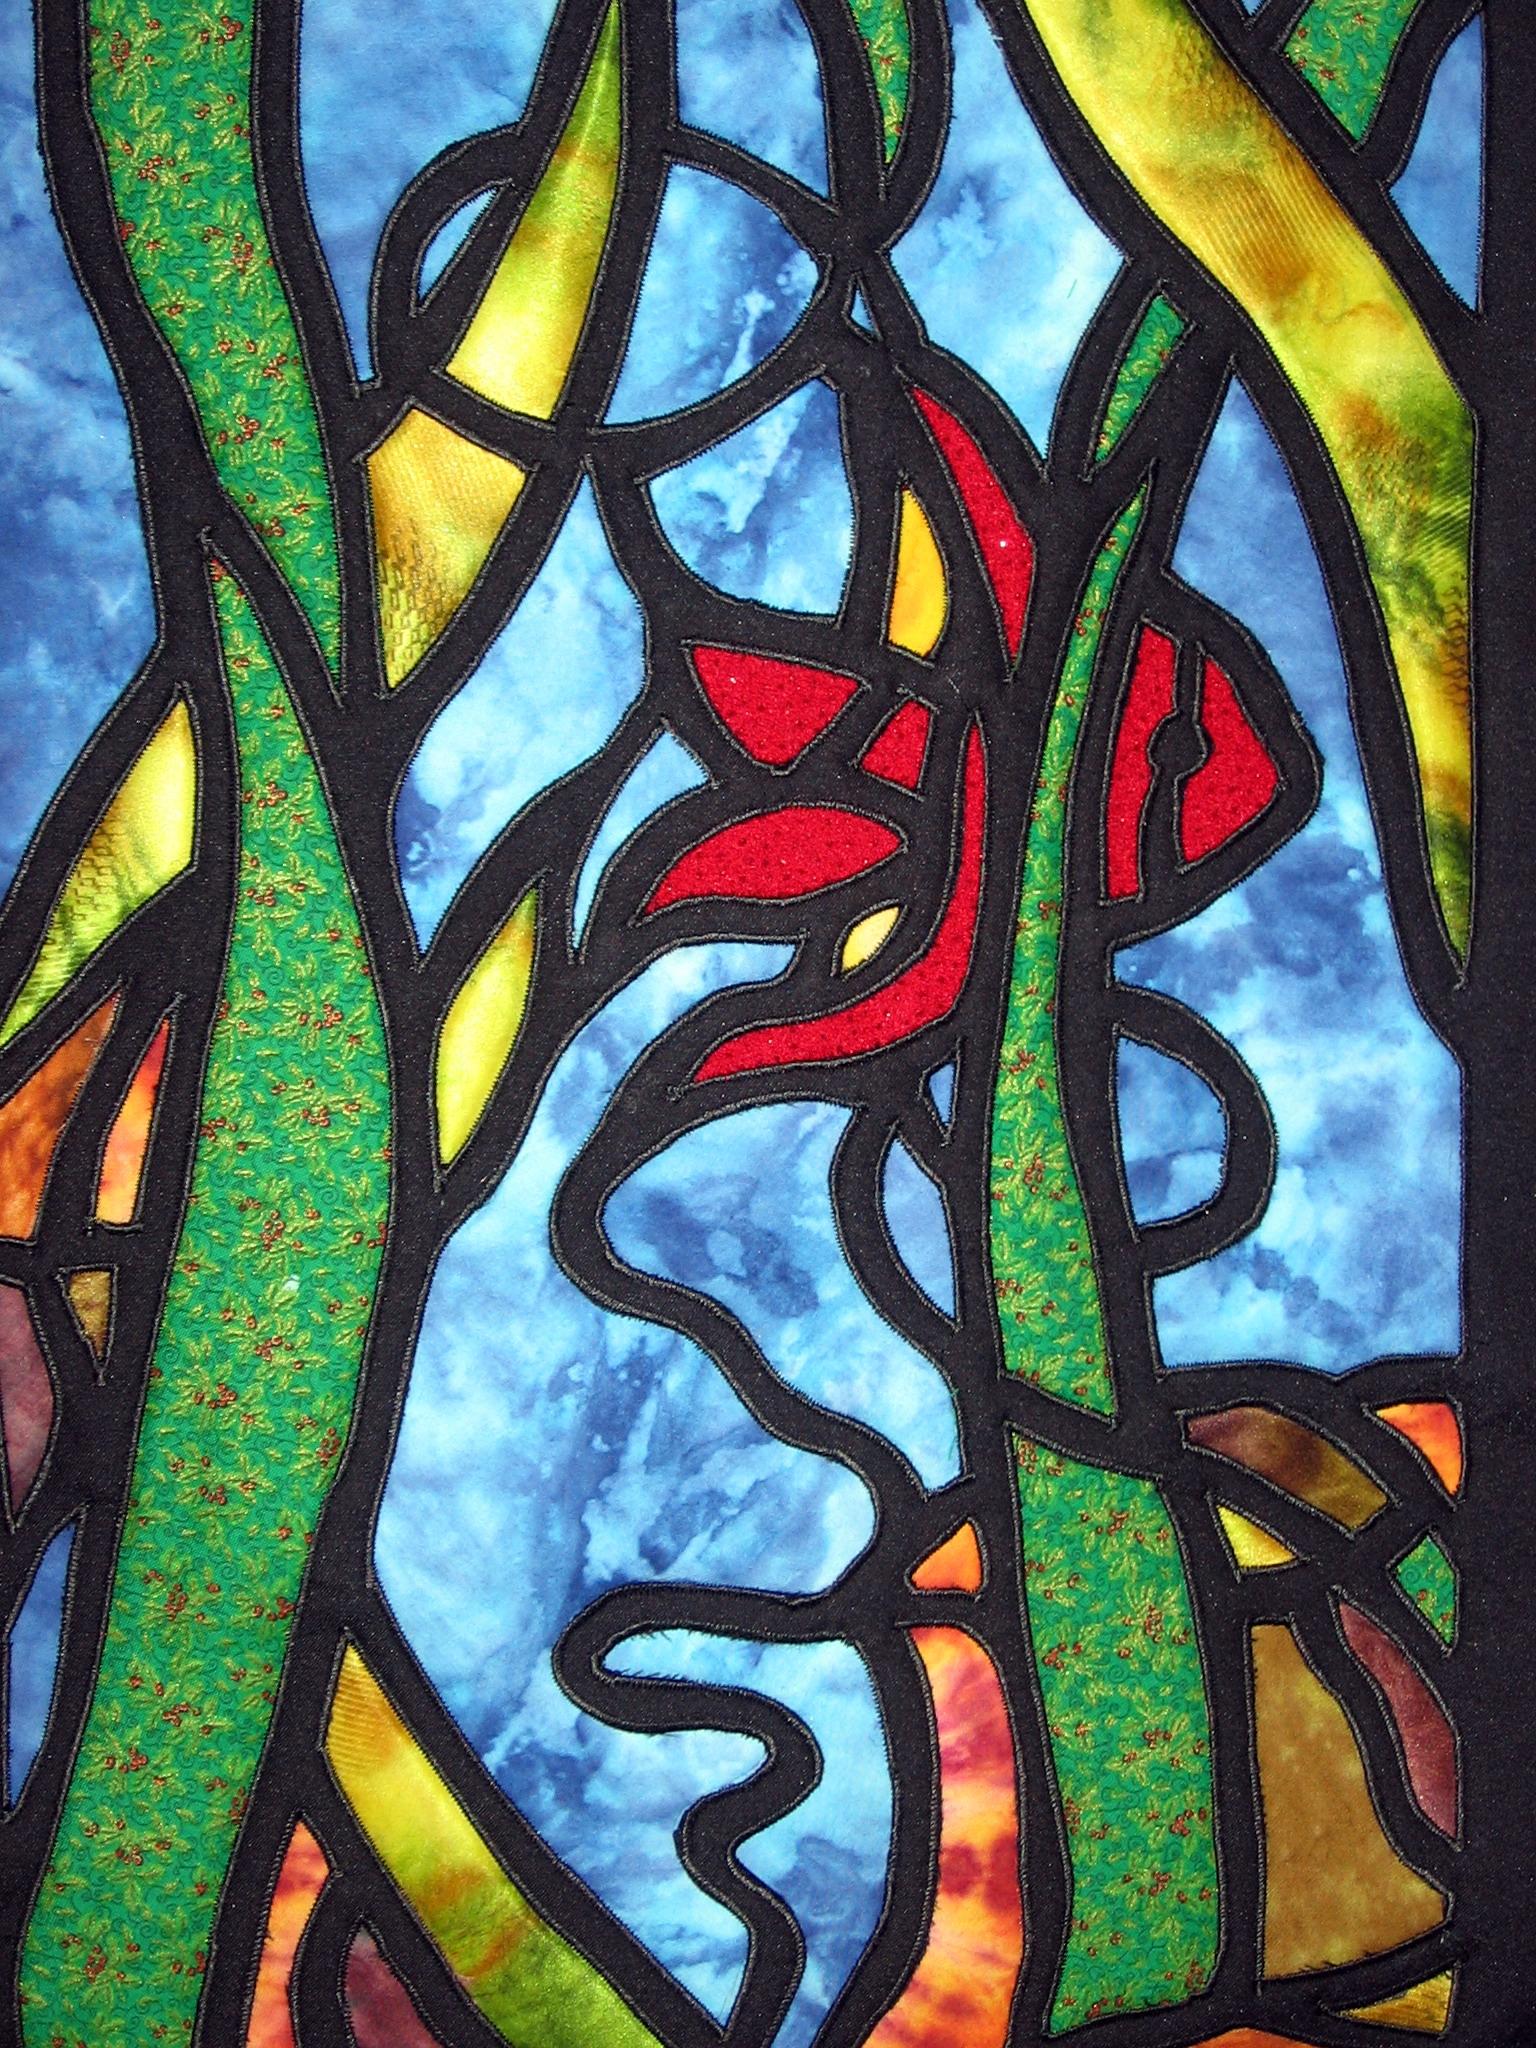 Vitrail by A Jamshidi 2008